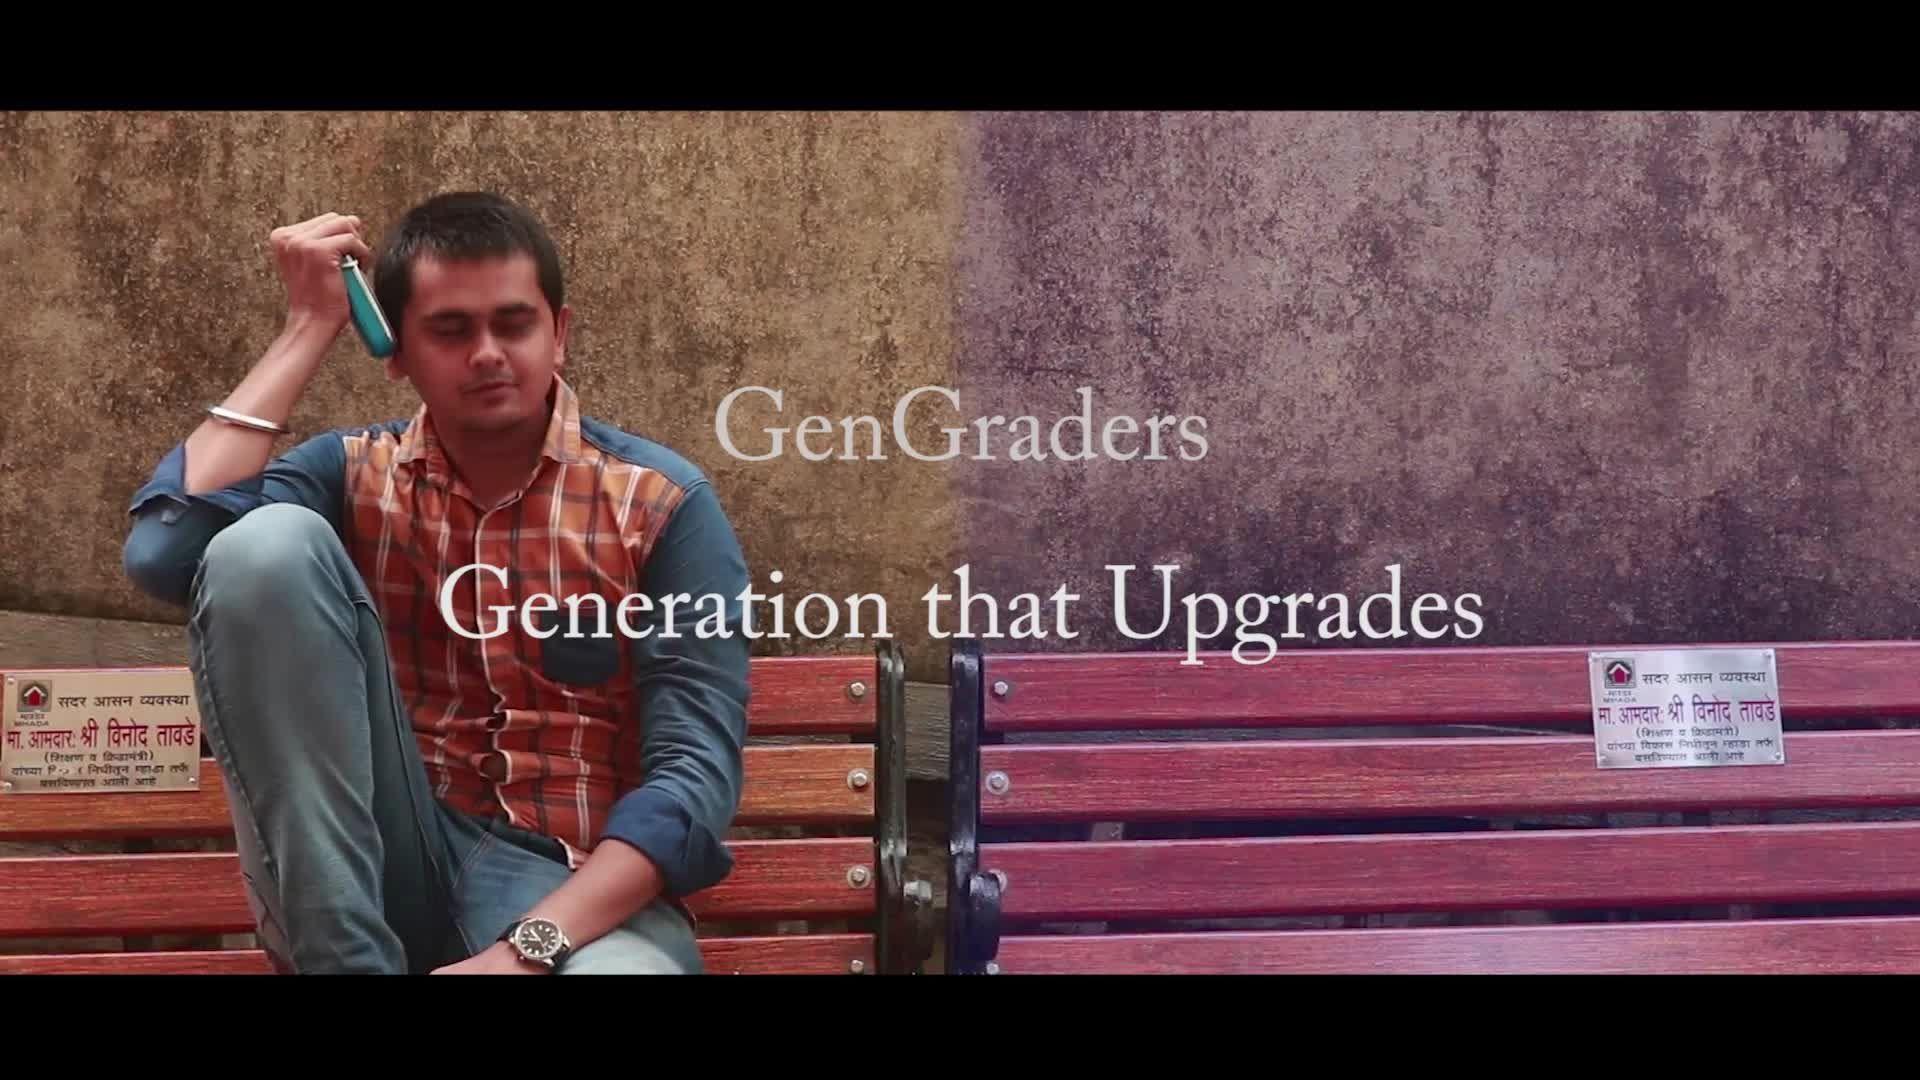 GenGraders Generation that Upgrades